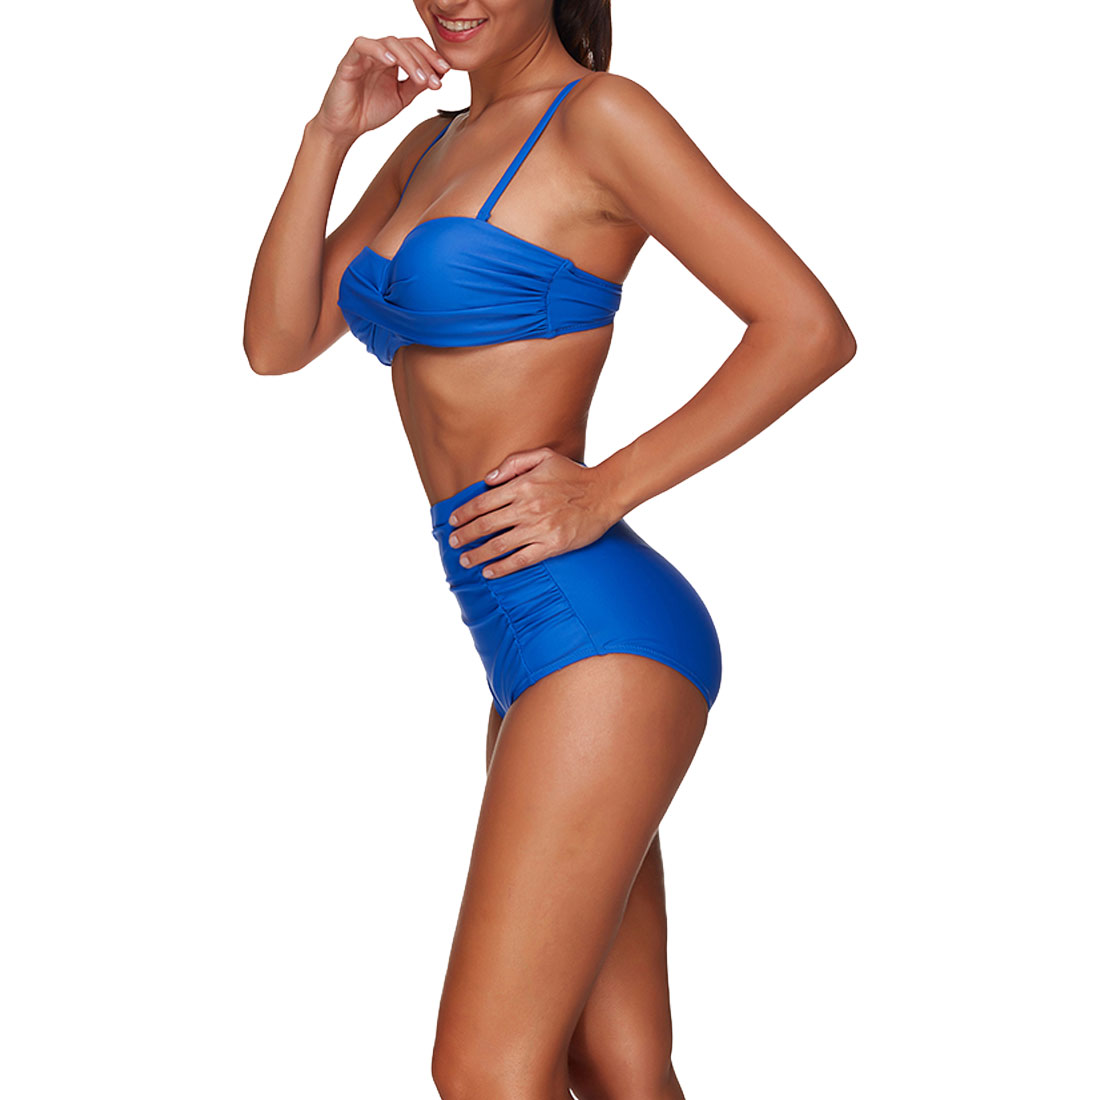 2018 Sexy Bikini Blue Halter Women Swimsuit Bandage Swimwear Vintage Bikini Set High Waist Swinsuit Roupa de banho Swim Wear